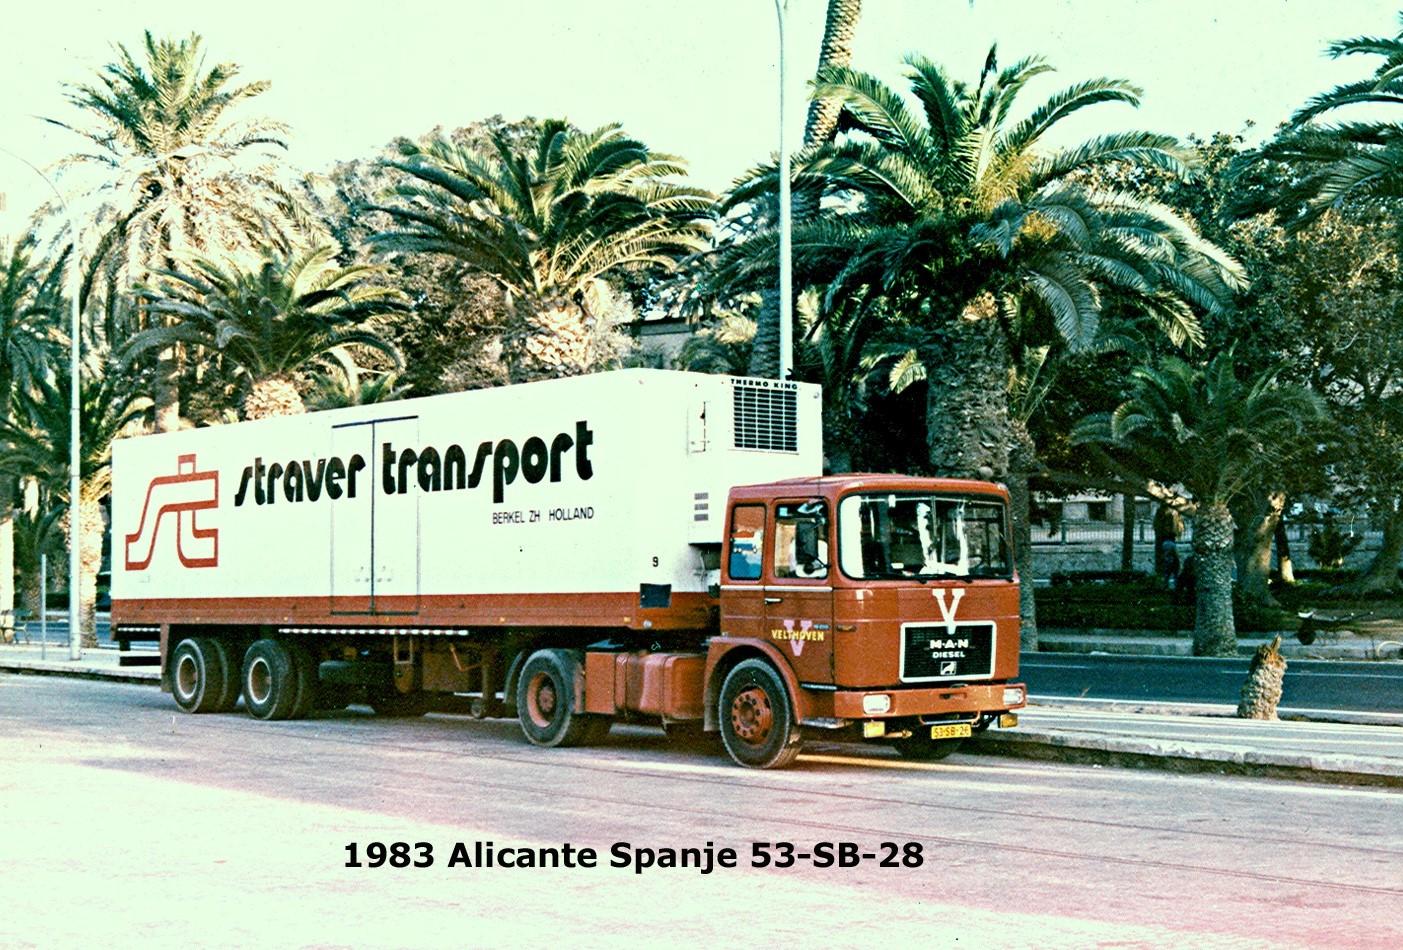 1983-Auto-53-SB-28-Alicante-Spanje-ritje-voor-Peet-Straver--Rob-Venema--